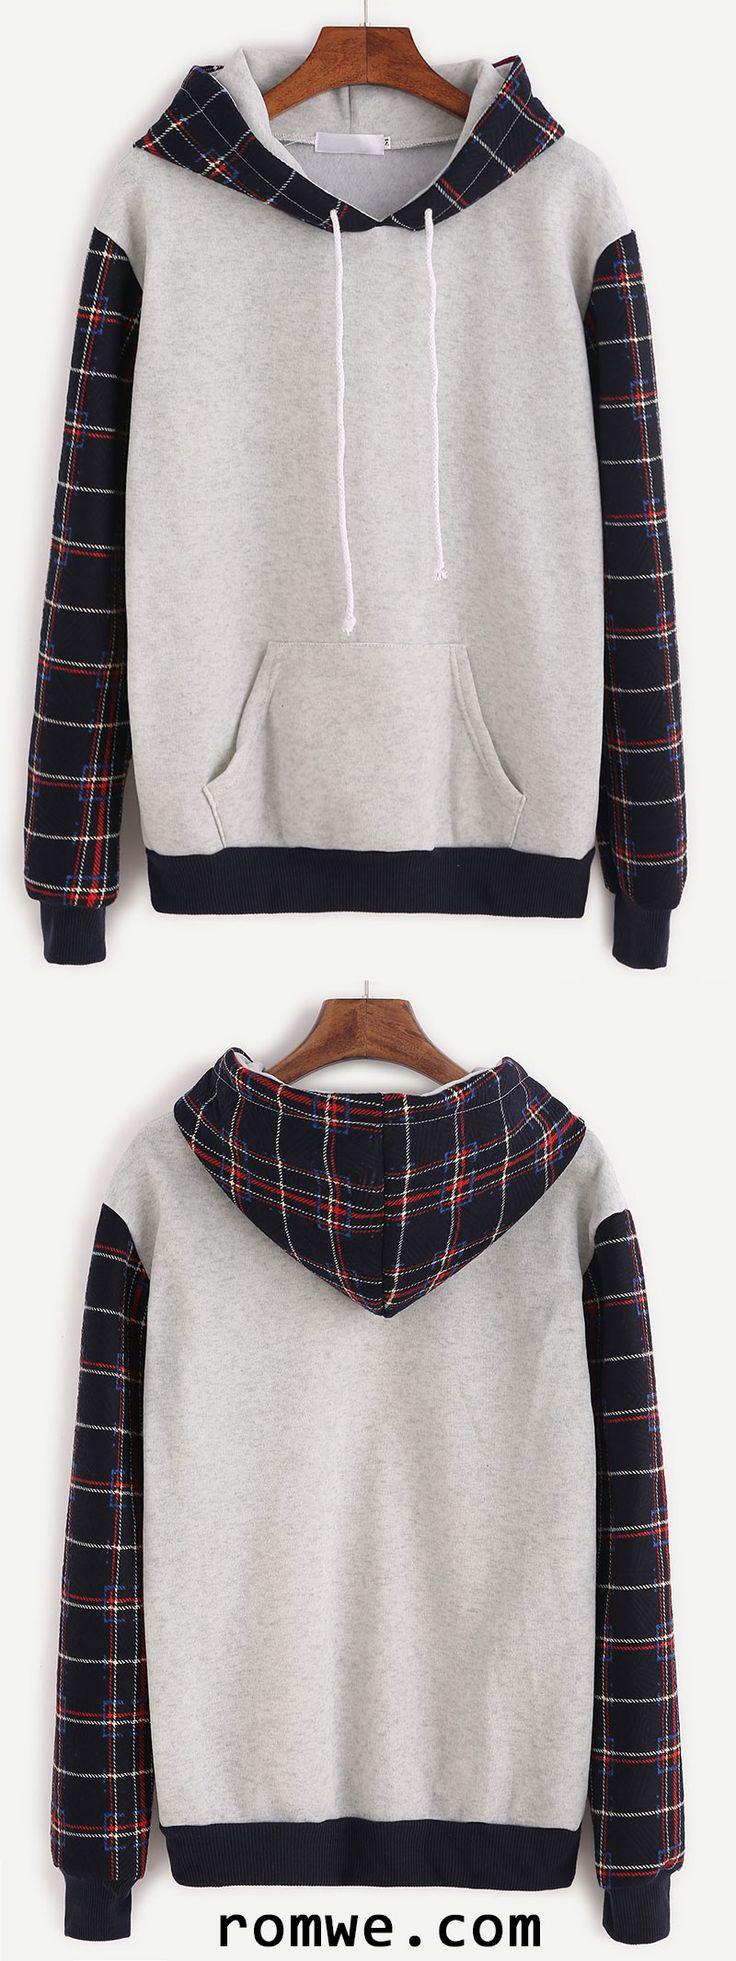 Grey Plaid Contrast Sleeve Drawstring Hooded Sweatshirt